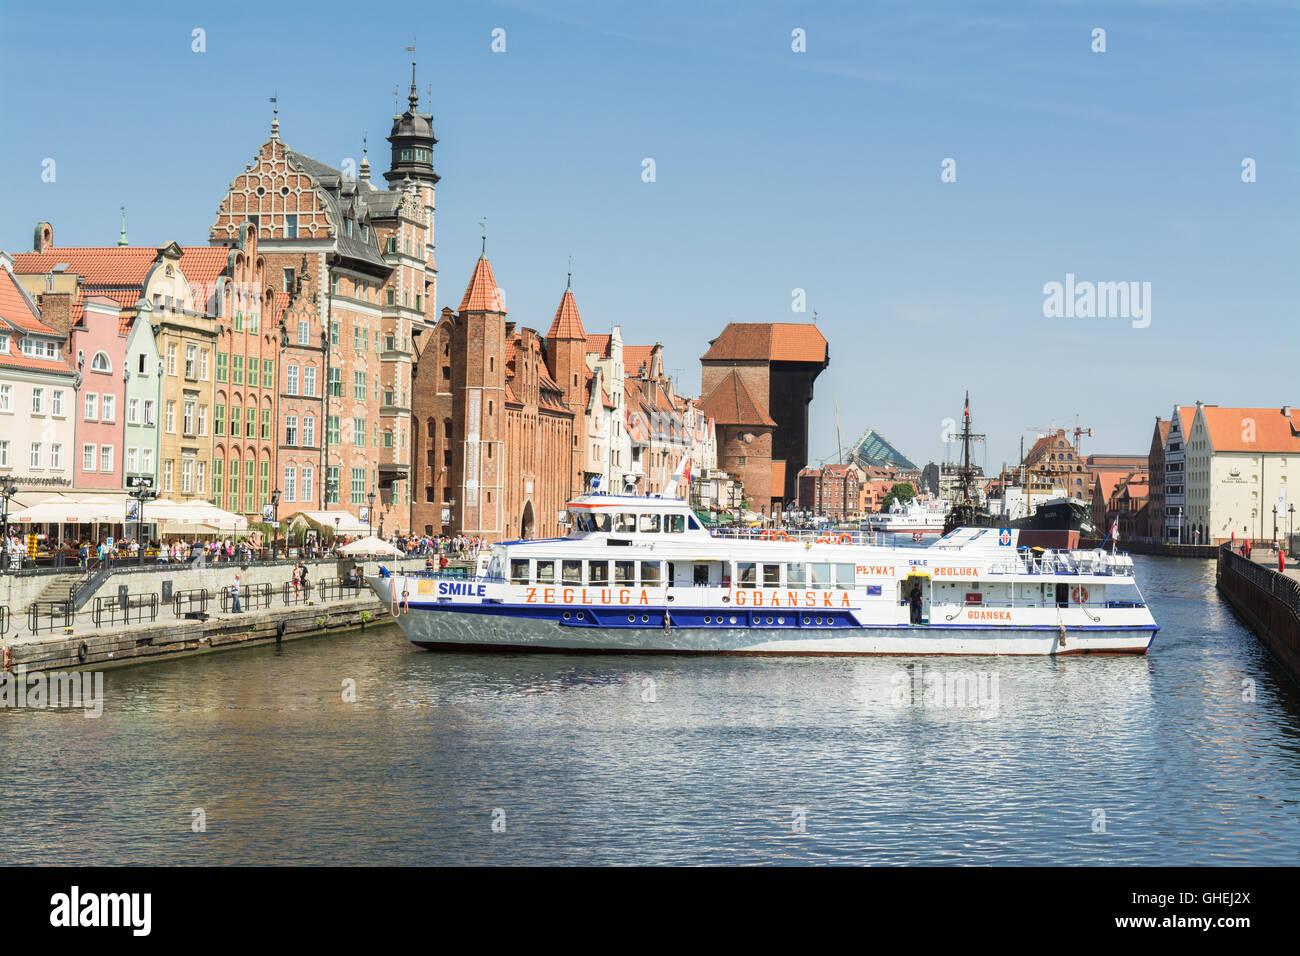 Danziger Altstadt Touristenbooten Kreuzfahrt auf der Mottlau, Danzig, Polen Stockbild